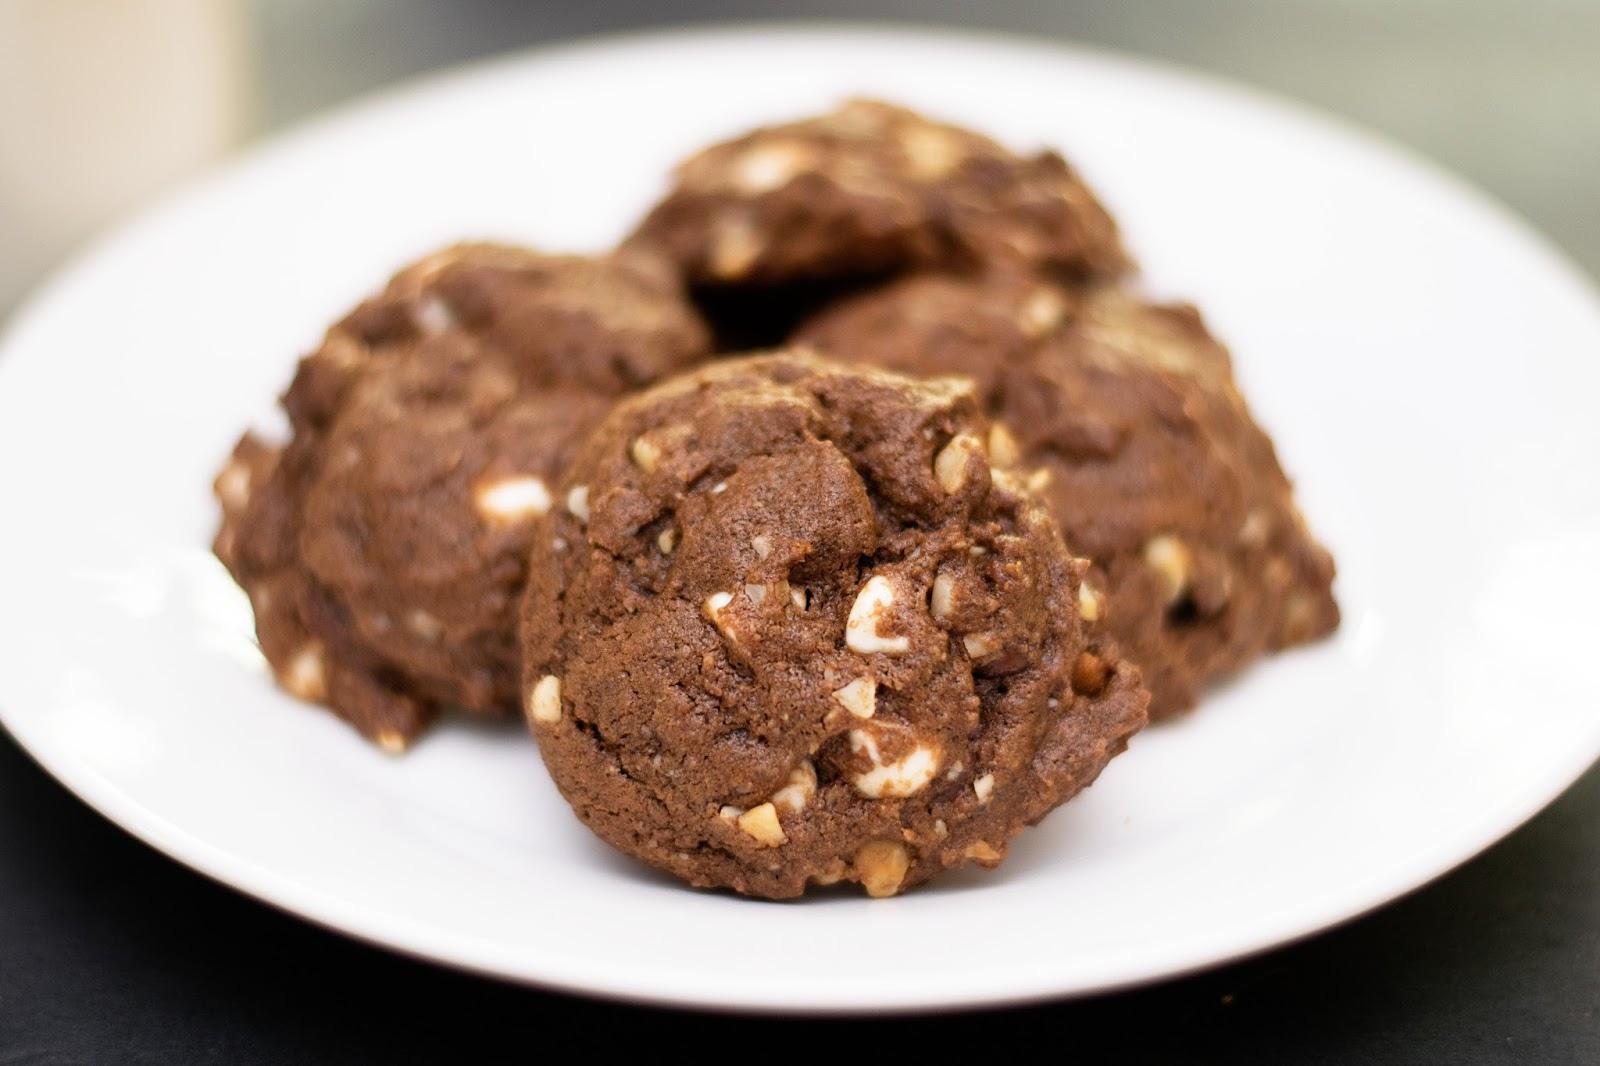 triple chocolate macadamia nut cookie recipe - ~the kitchen wife~